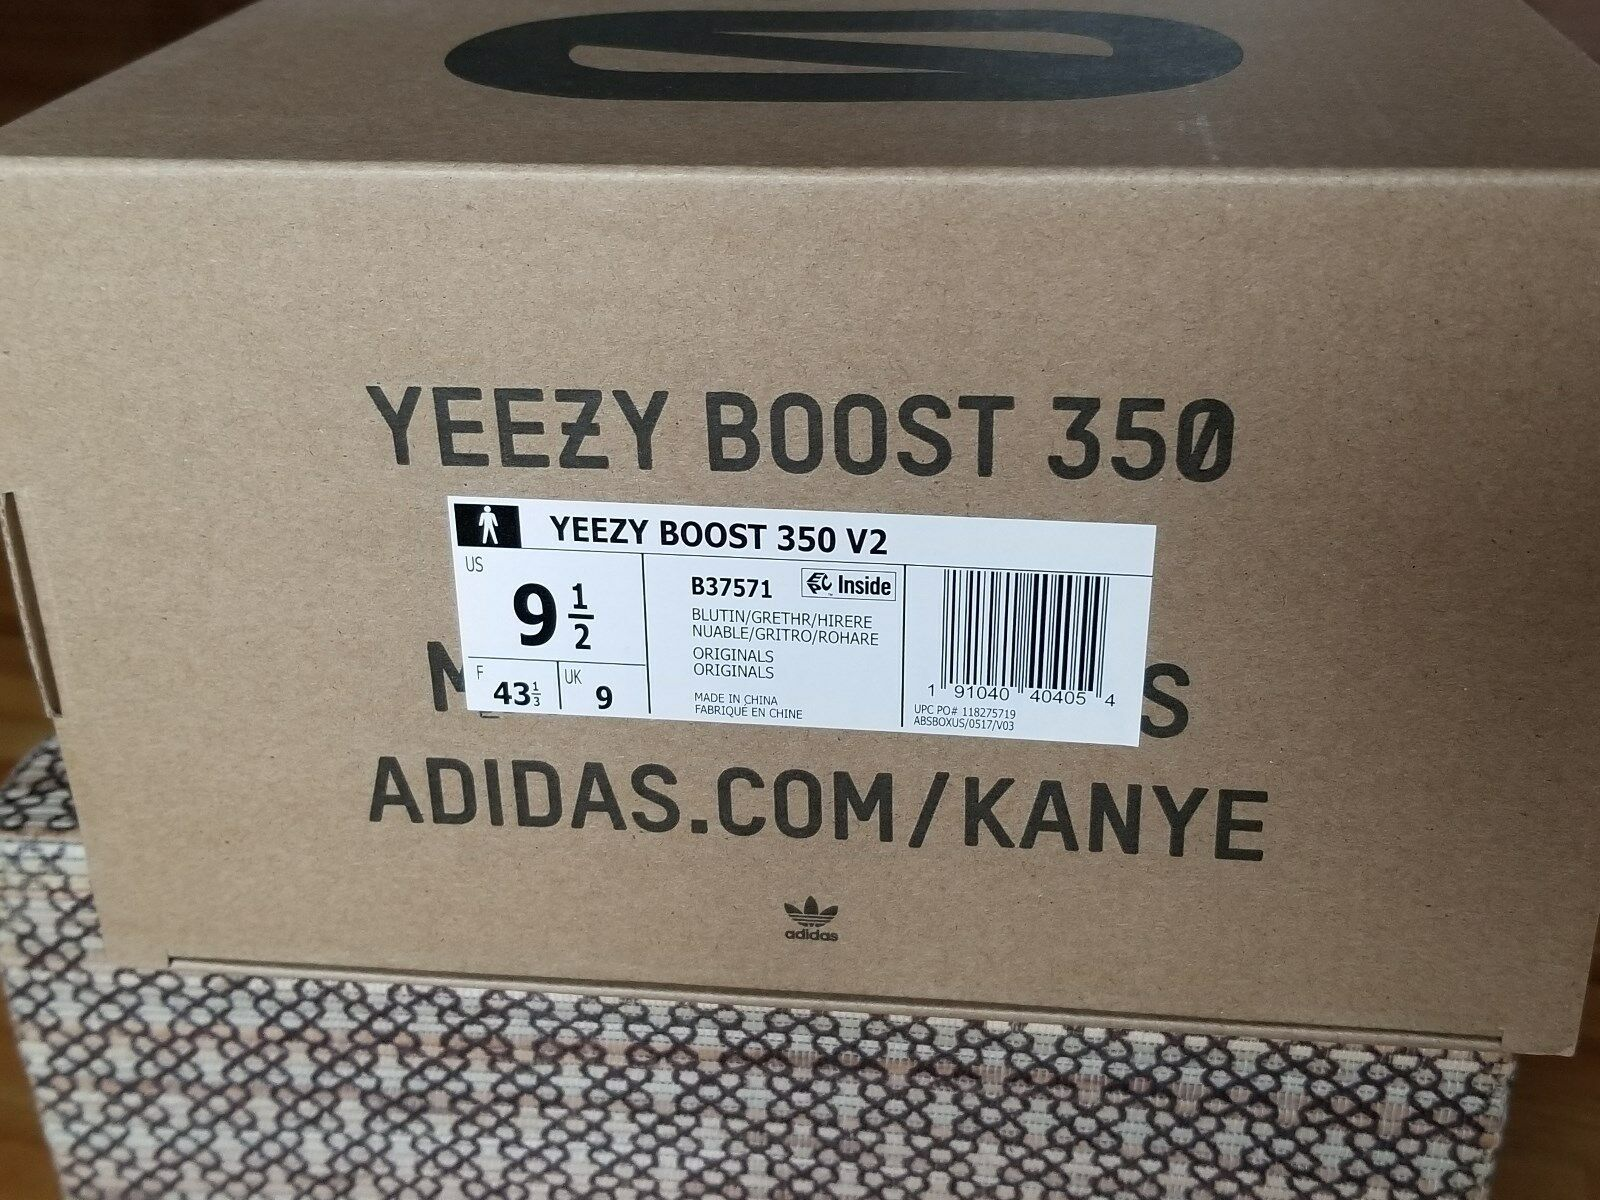 Adidas Yeezy Boost 350 V2 Blau Getönt Grau Rot B37571 Vorrat Neu Box Größe 9.5 image 9